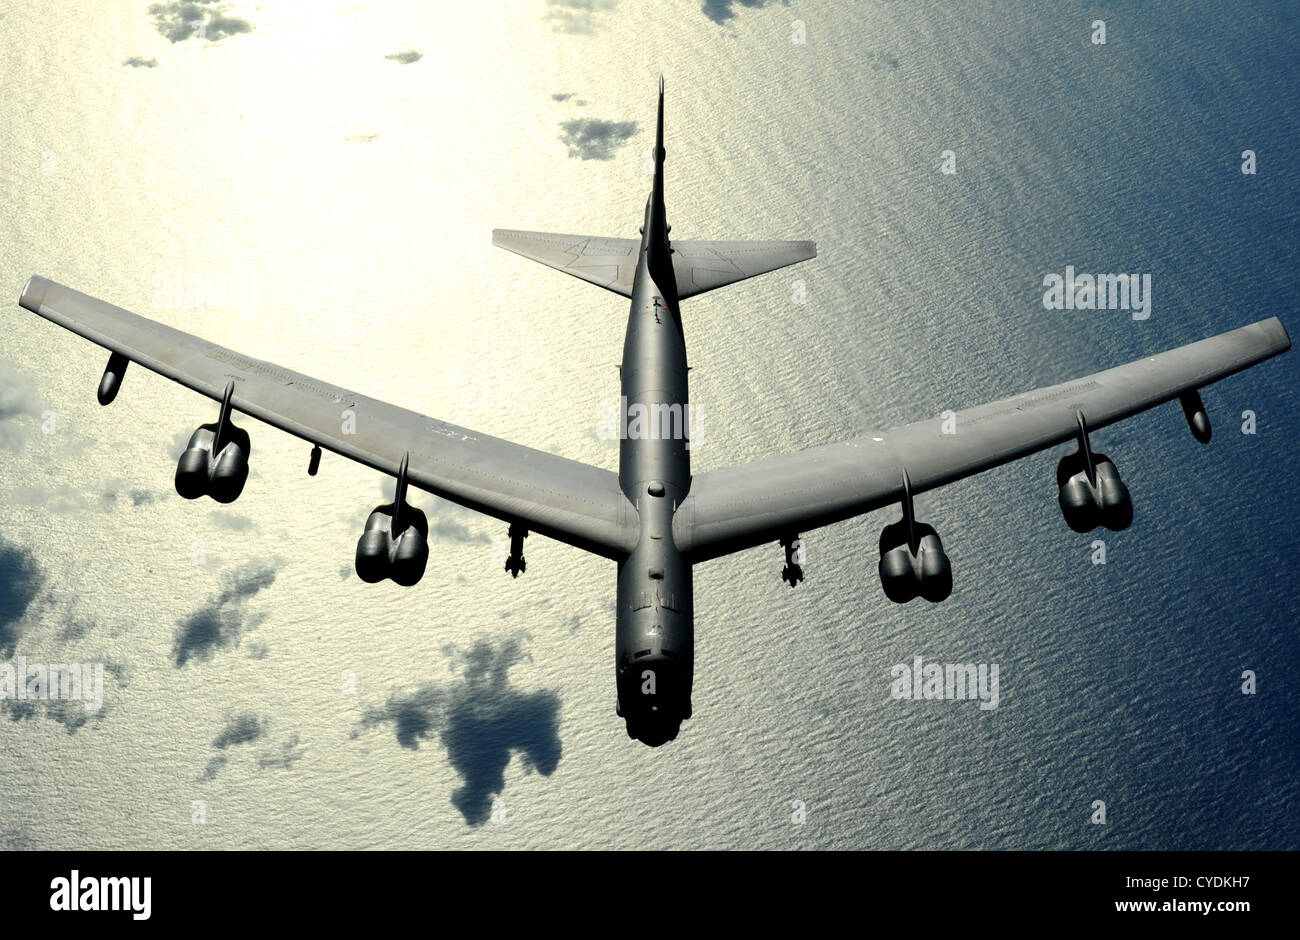 L'US Air Force B-52 Stratofortress en vol le 13 novembre 2008 sur Guam. Banque D'Images